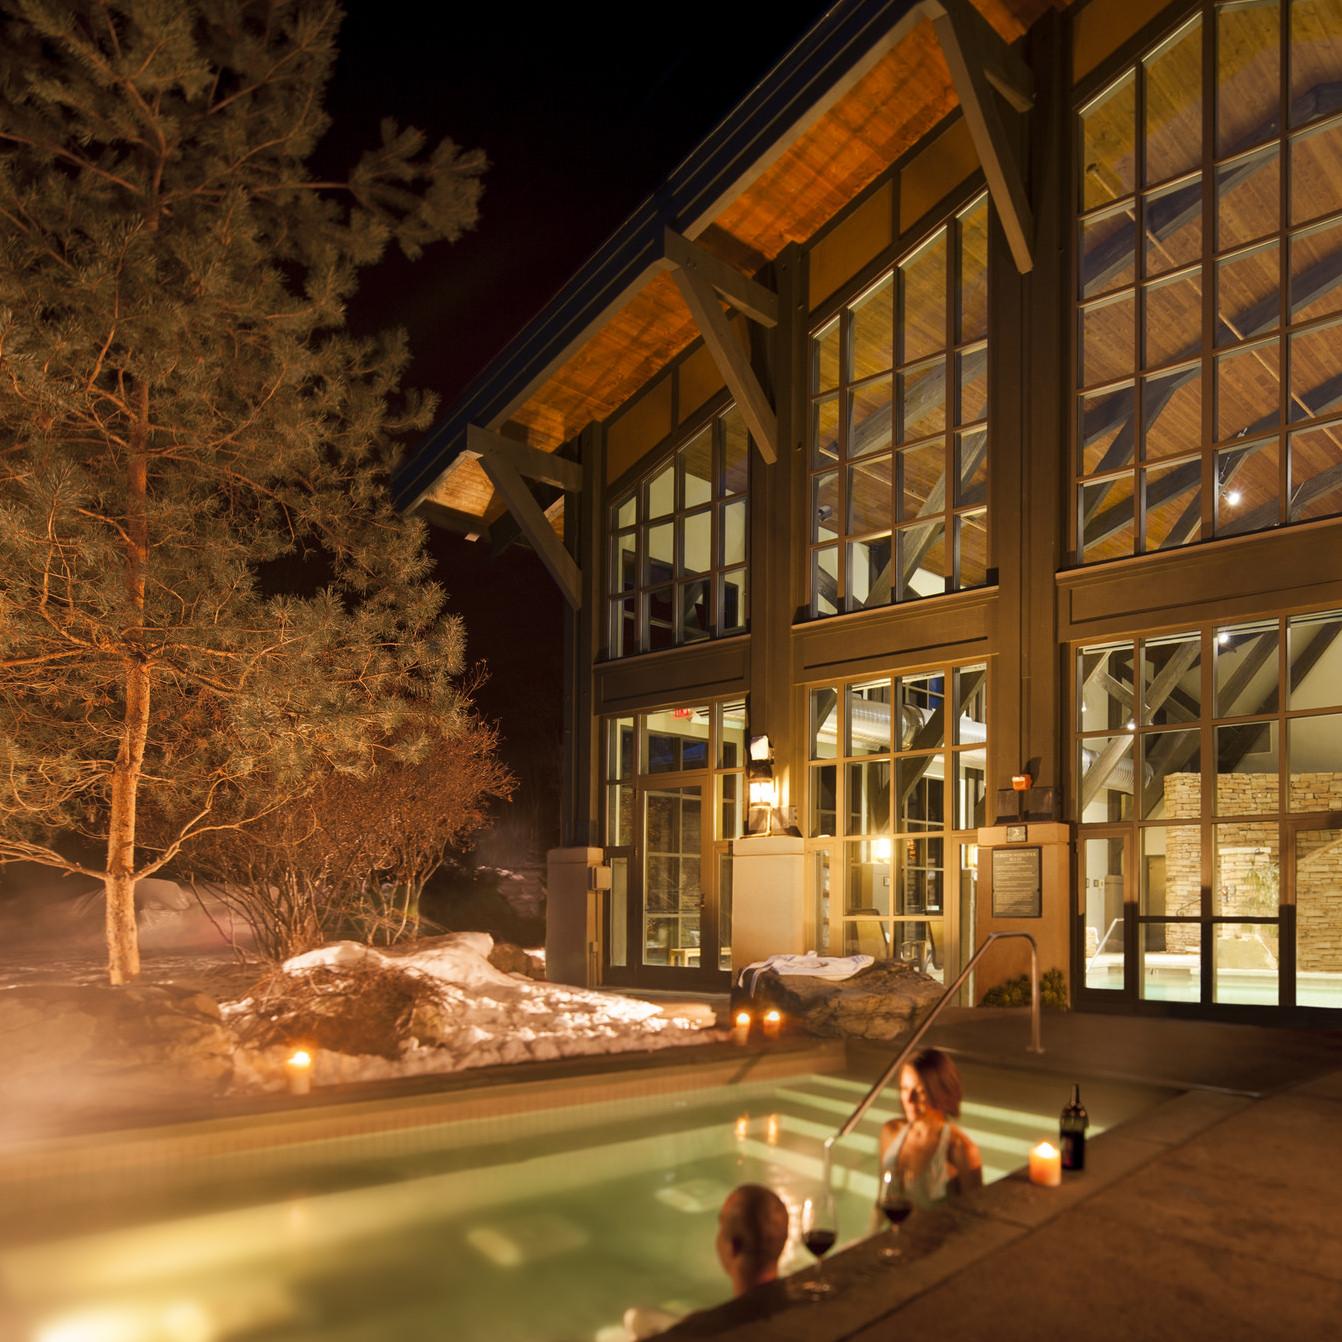 https://www.travelersjoy.com/blog/Woodloch_honeymoon_spa_retreat-6.jpg